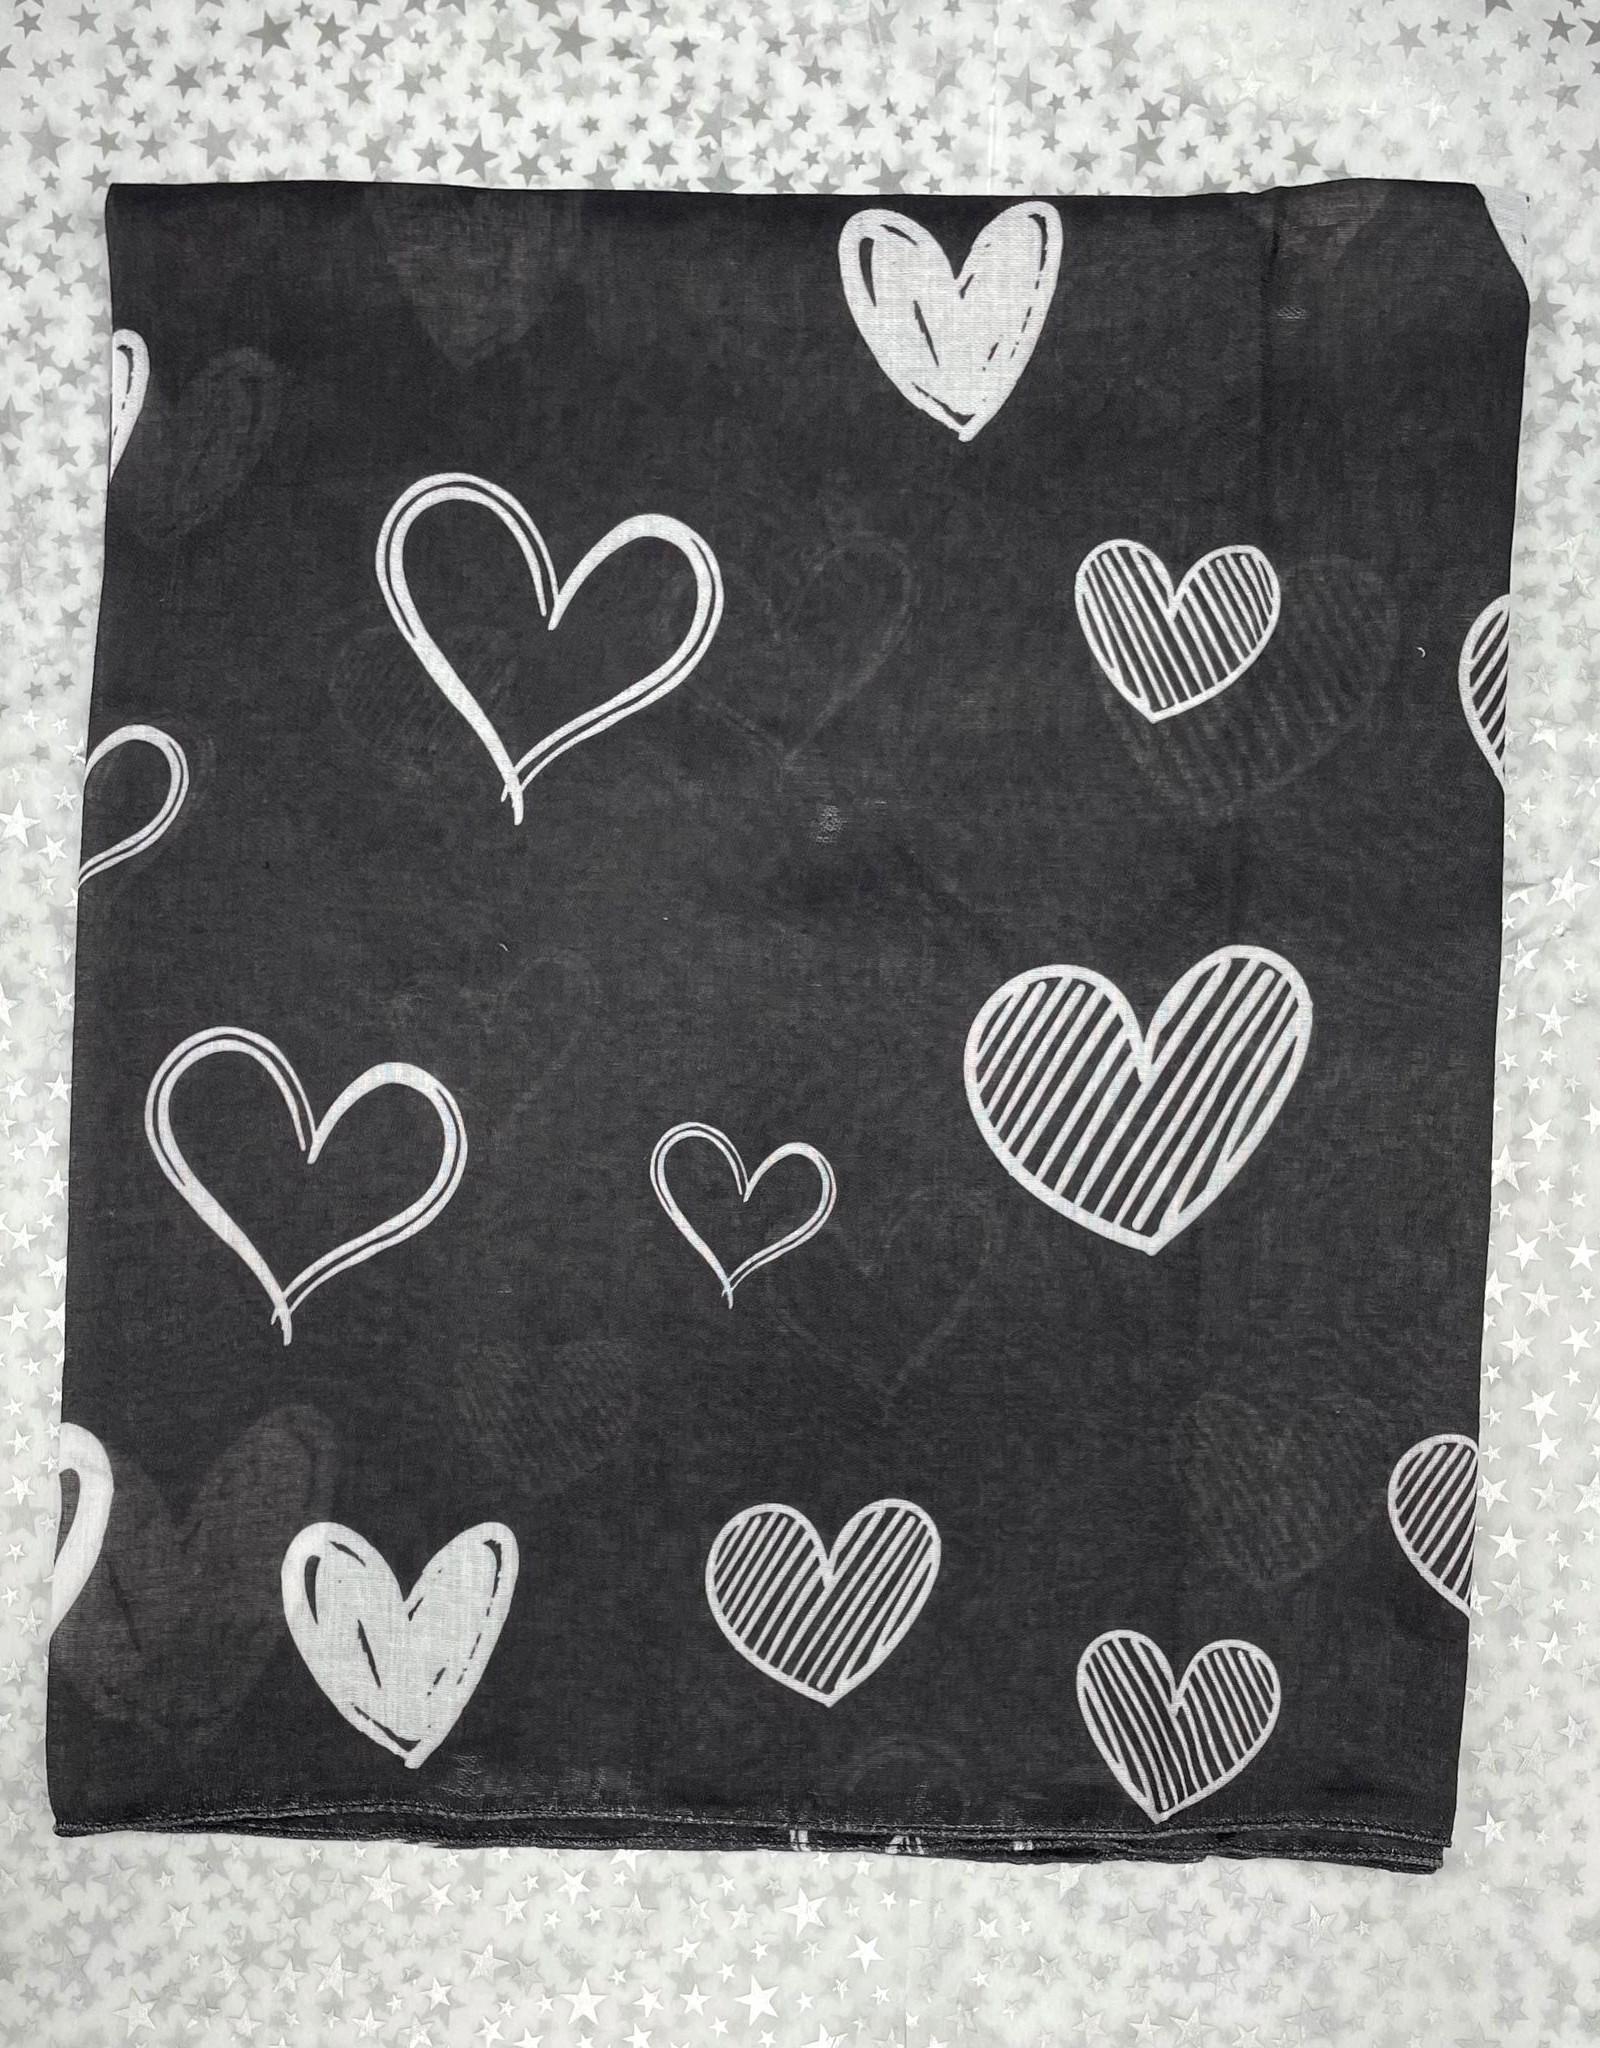 PinkDot PinkDot Assorted Hearts Flat Mitpachat